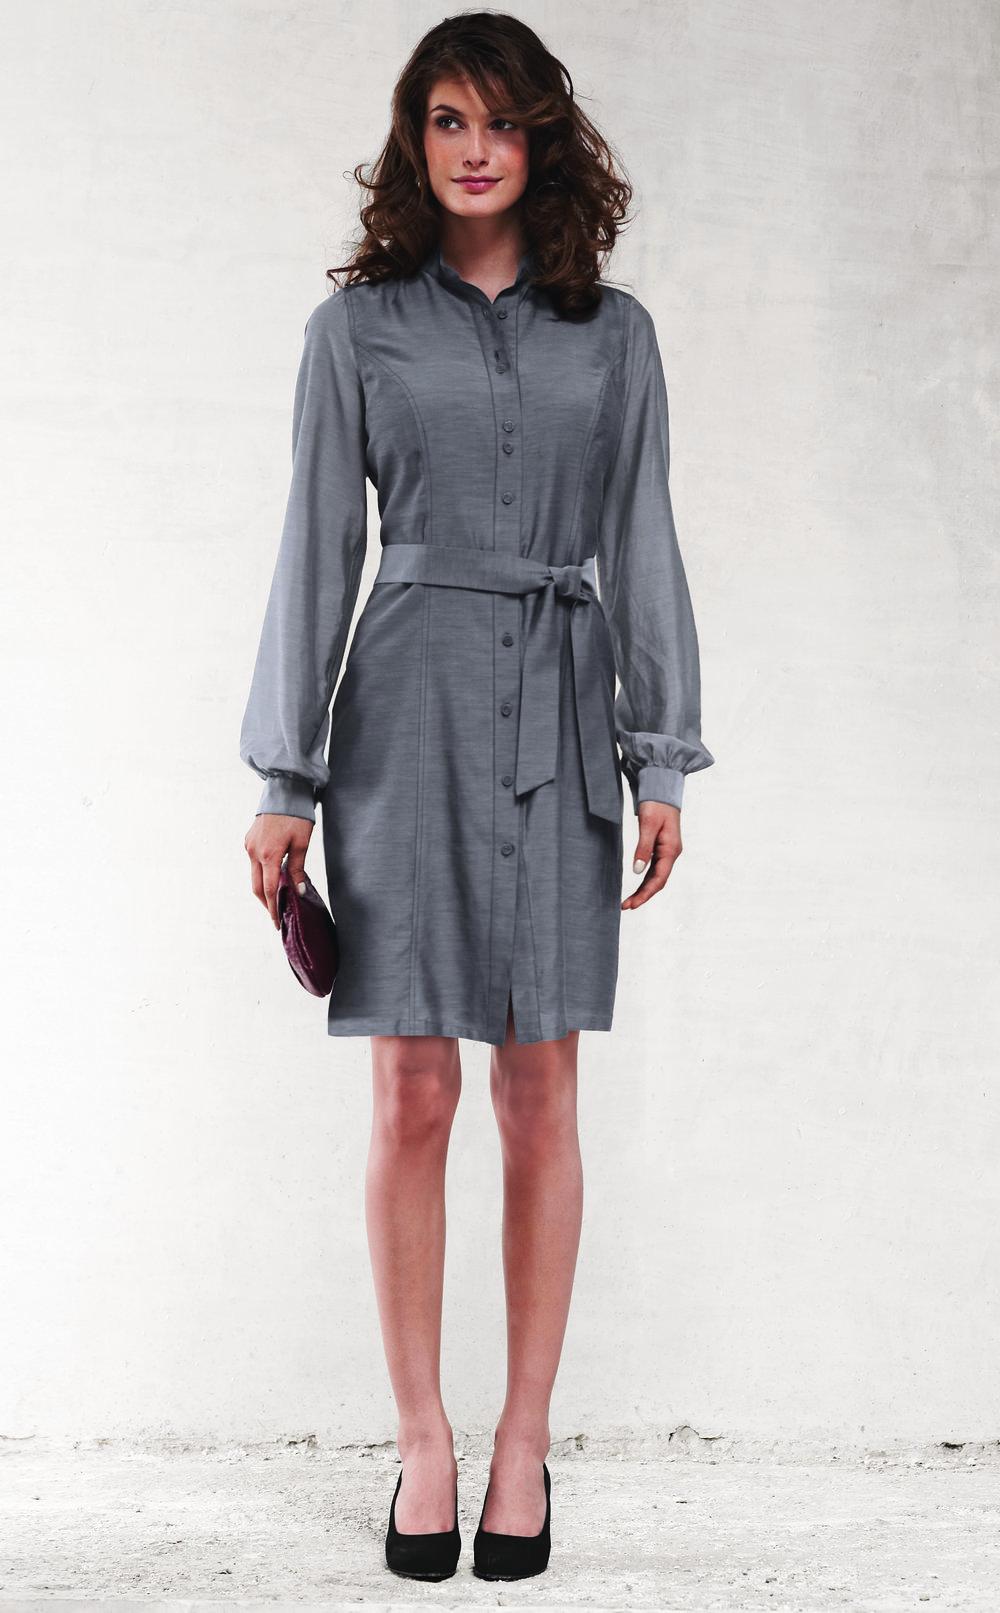 Nashville Wardrobe Stylist, Katie Ferrell's portfolio